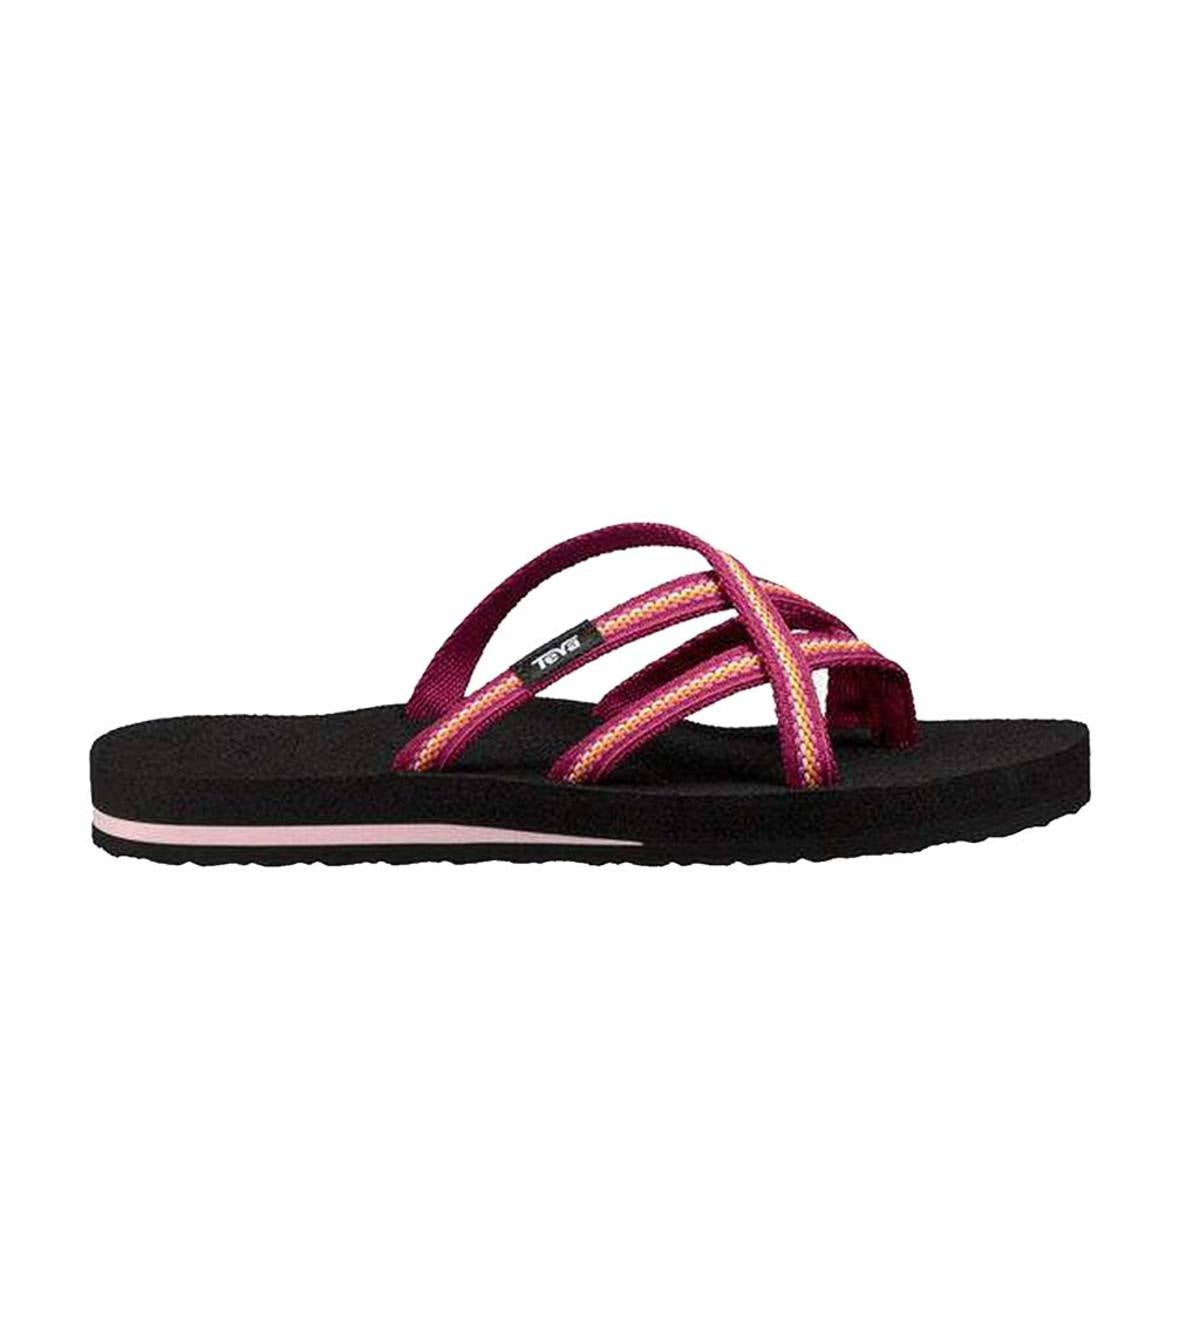 b46f0e8ea5e651 Teva Women s Mush Olowahu Flip Flops - Boysenberry - Size 6